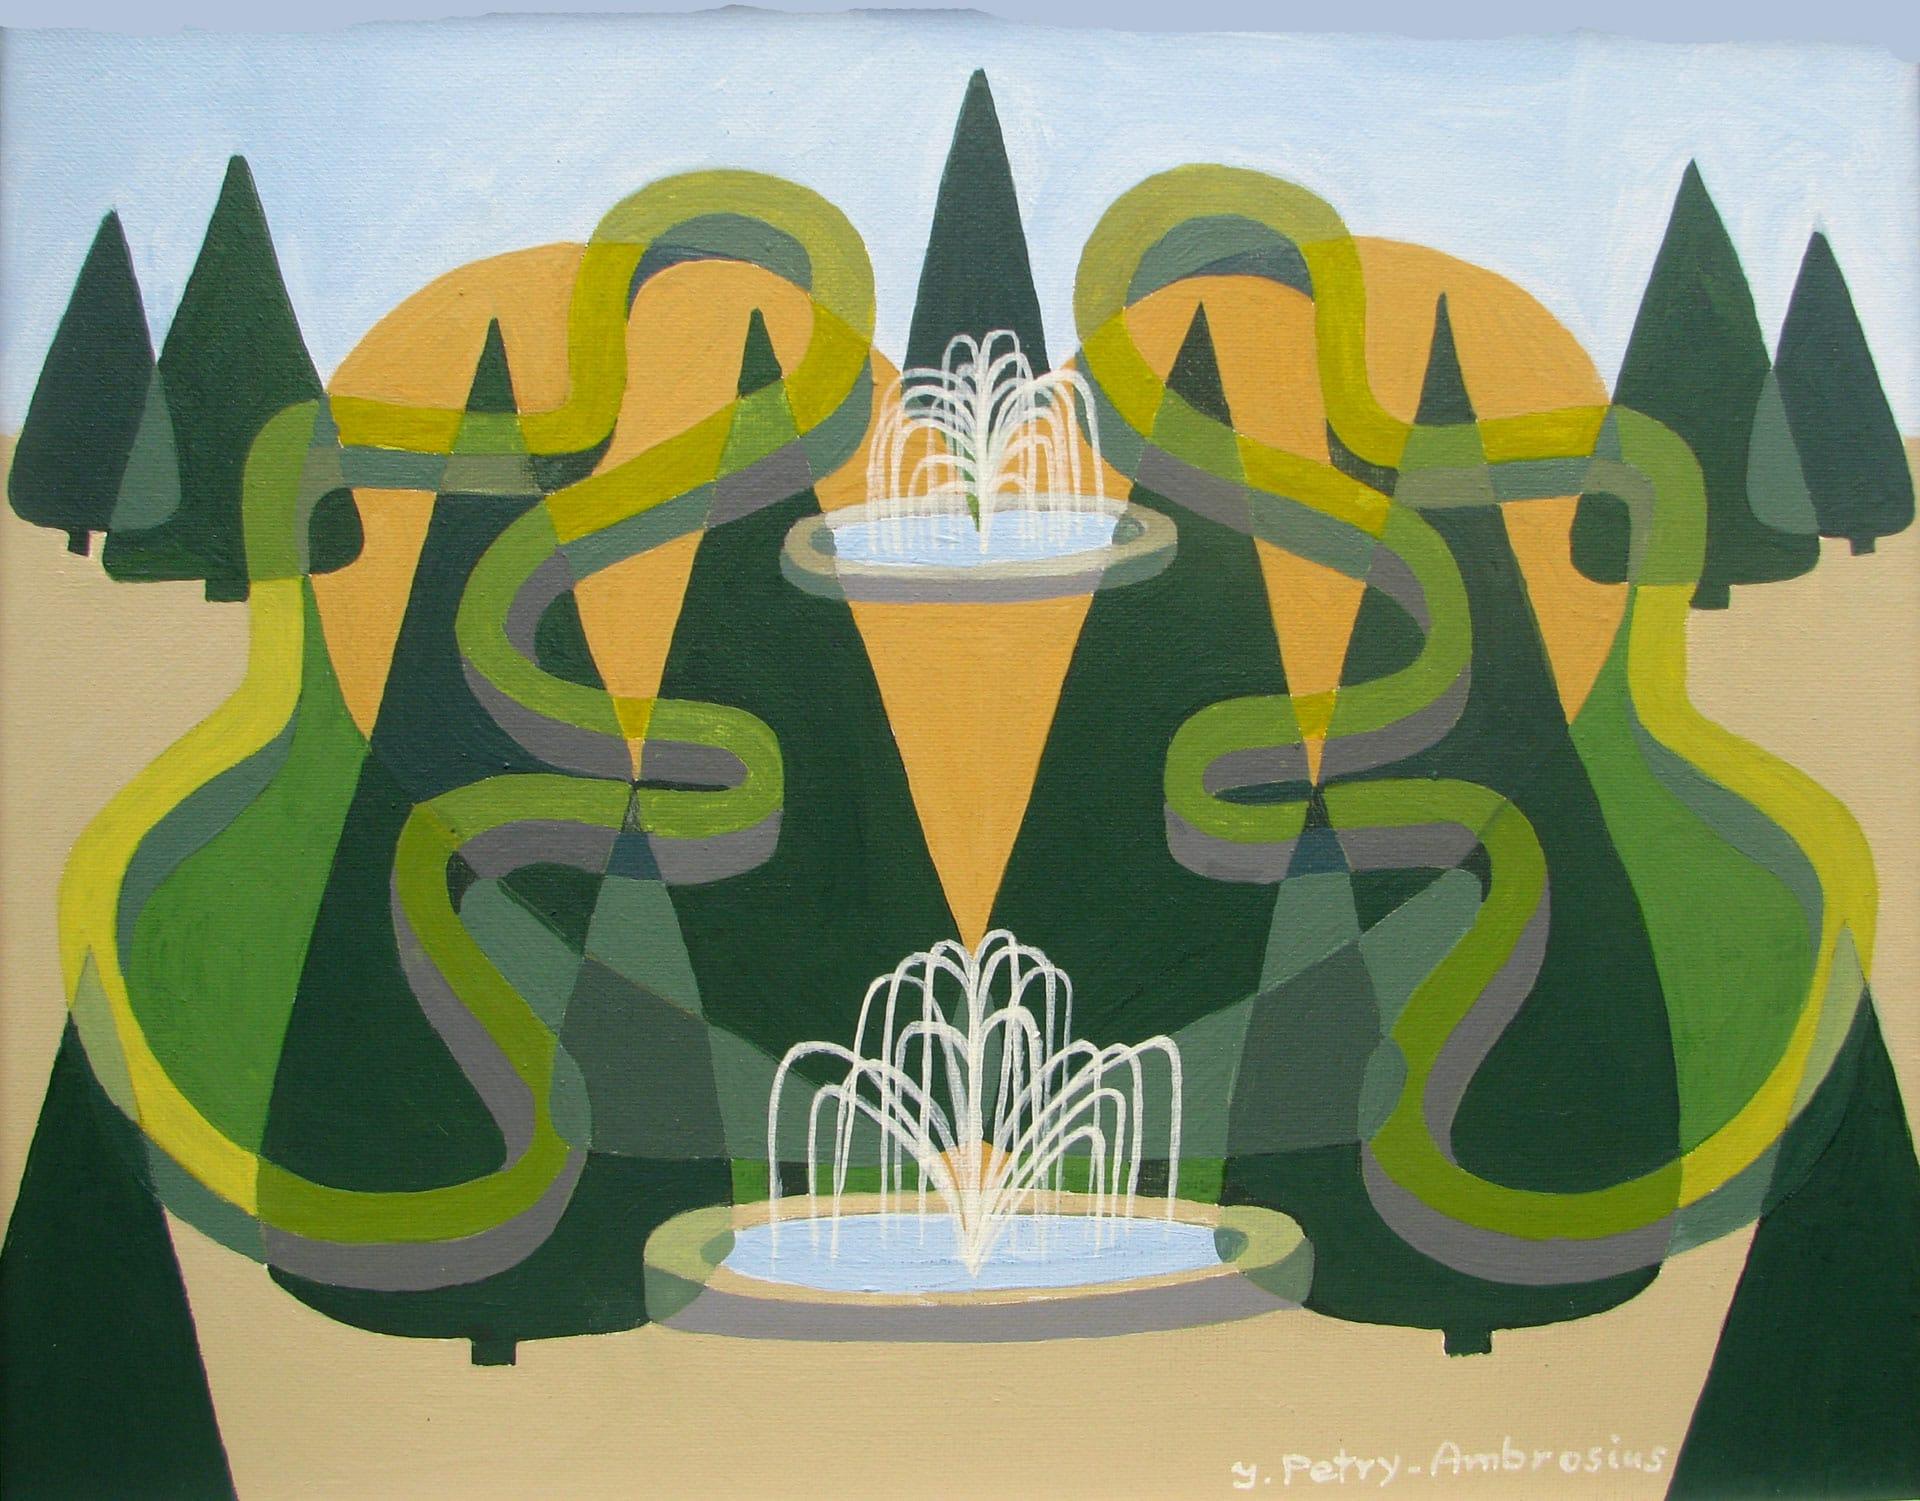 Ilse Petry-Ambrosius: Klostergarten Kamp-Lintfort (Acryl auf Leinwand, 50x60 cm)